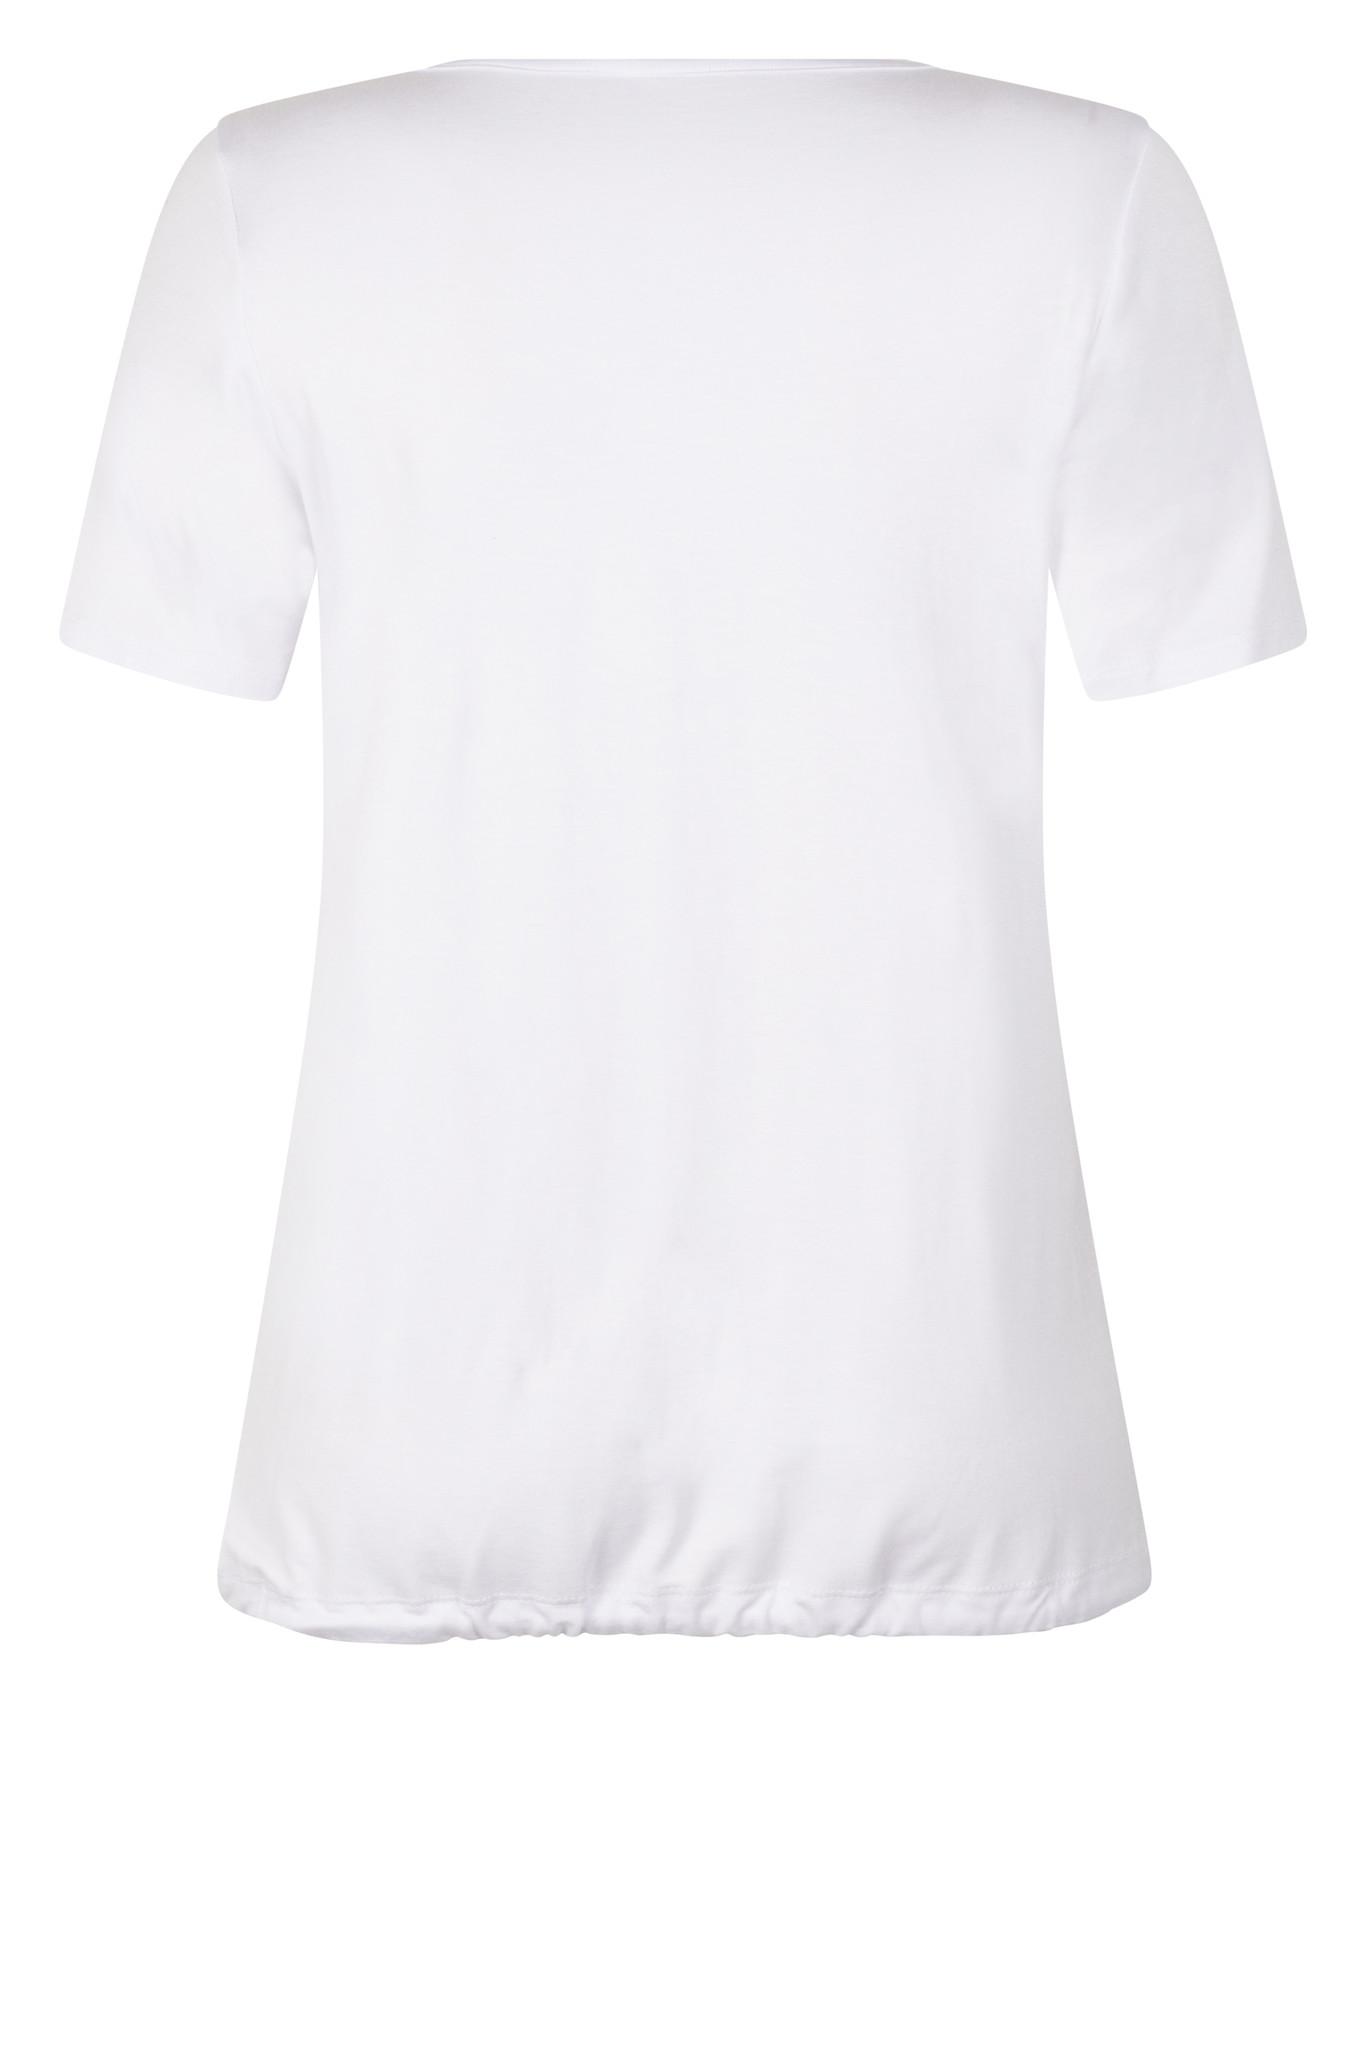 Zoso Zoso Mixit T shirt mixed fabrics  white/navy